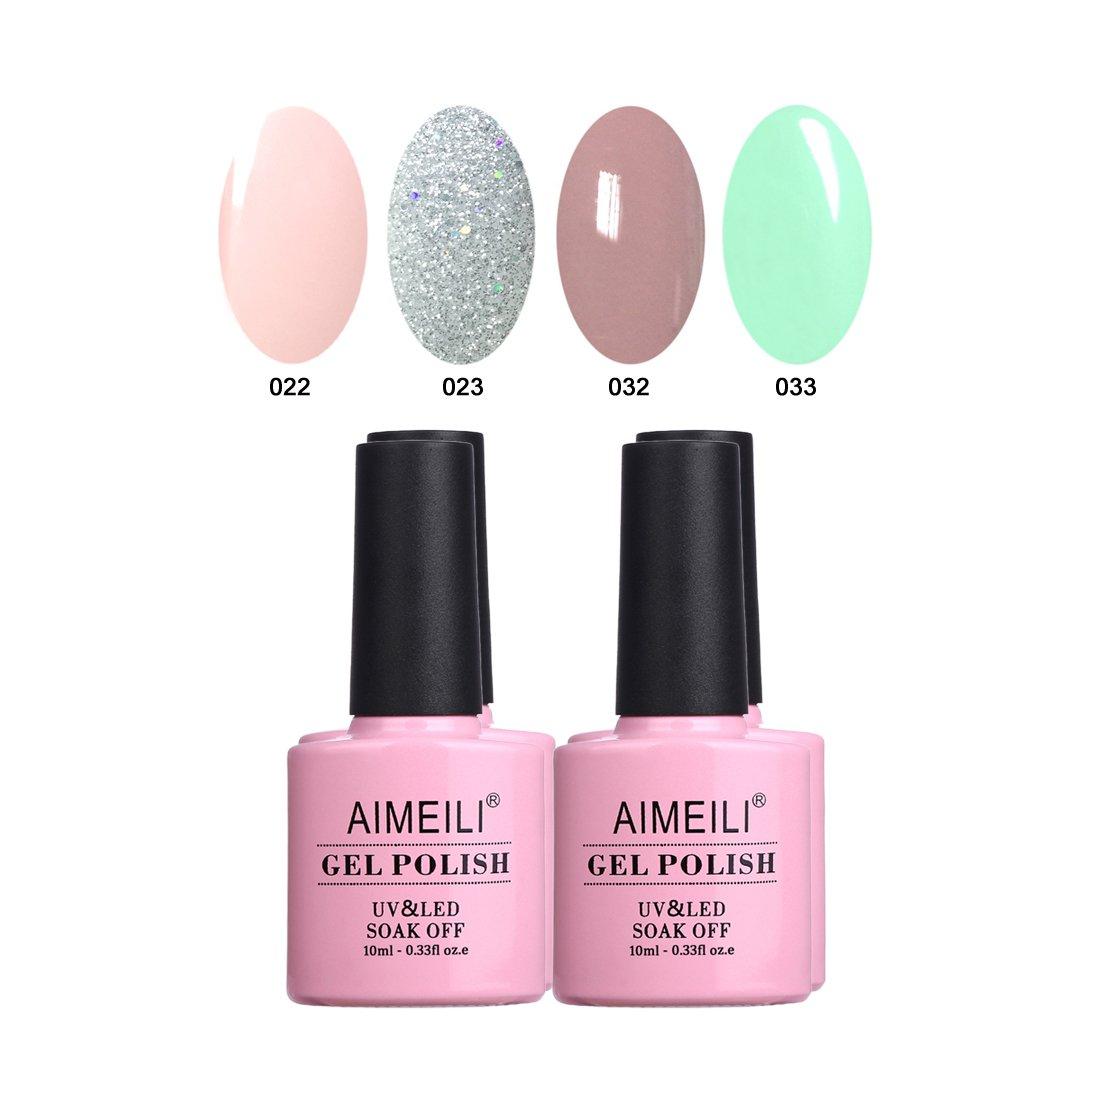 AIMEILI Nude Gel Nail Polish Set Soak Off UV LED Gel Polish Multicolour/Mix Colour/Combo Colour Of 4pcs X 10ml - Gift Kit 18